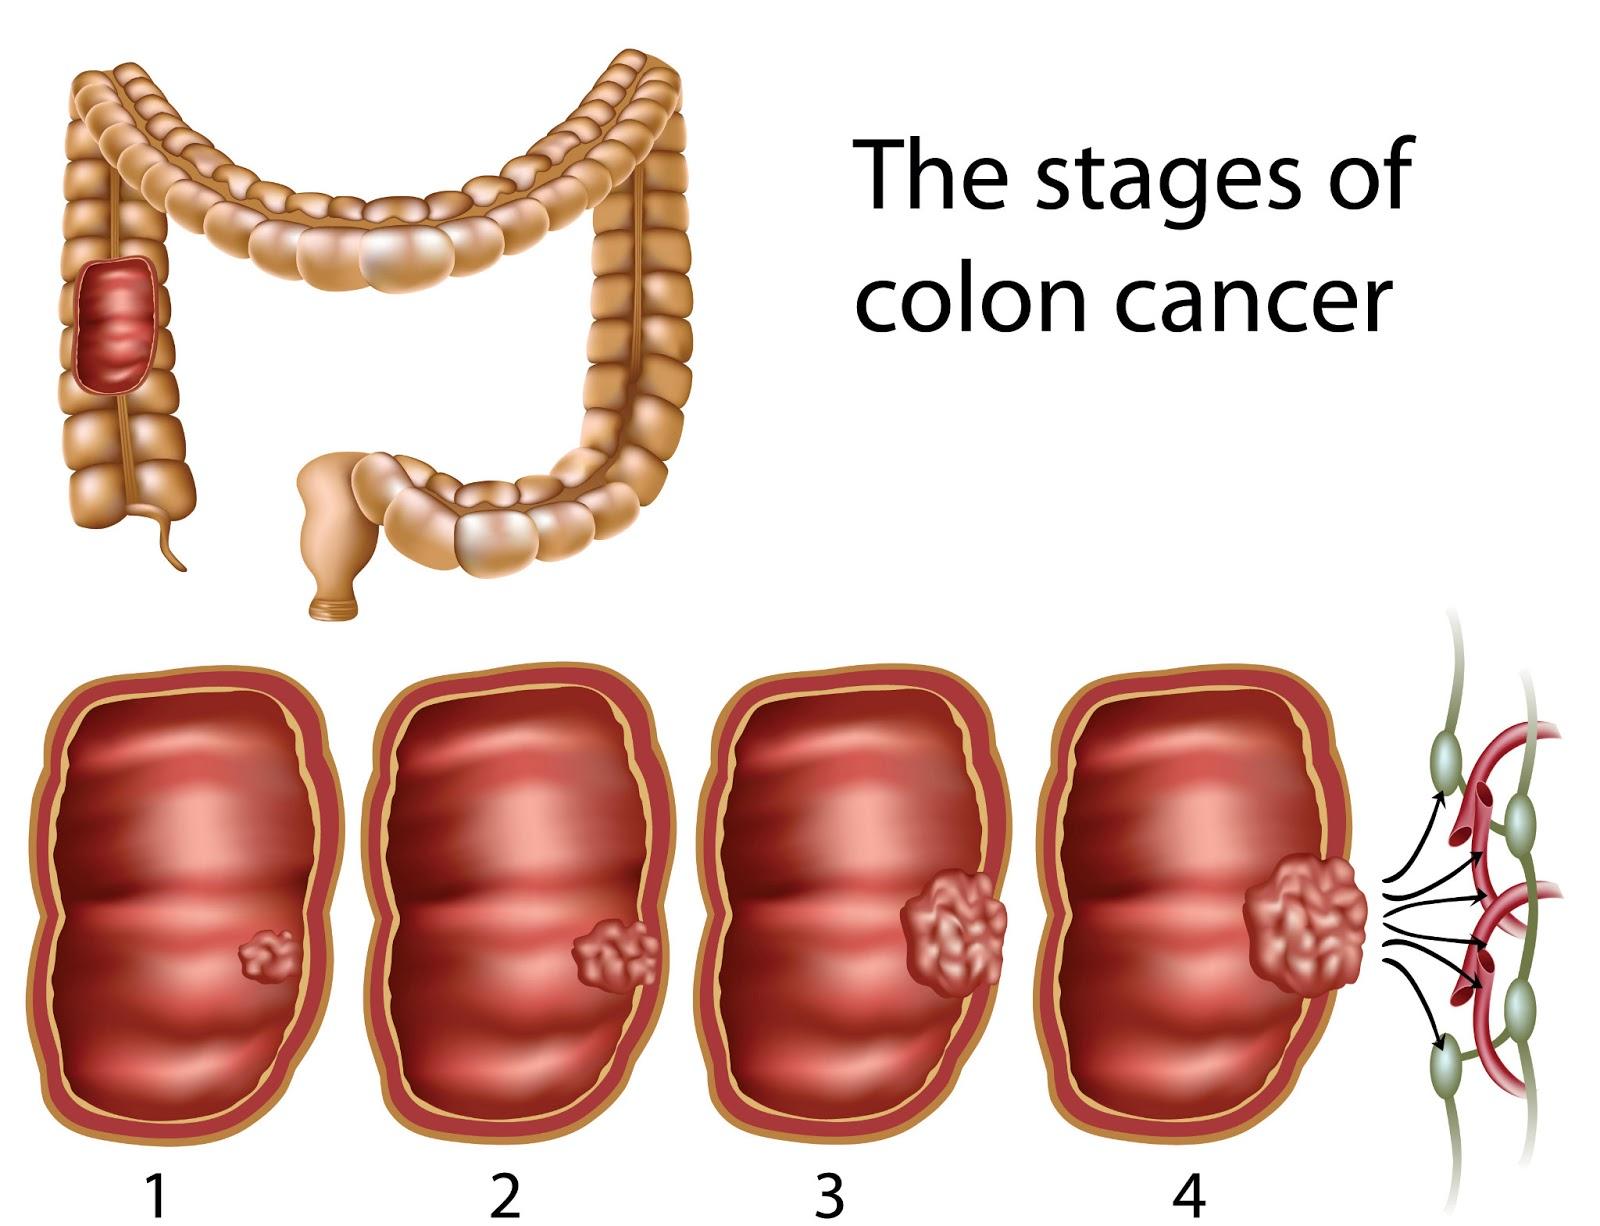 Colon Cancer Treatment: February 2013